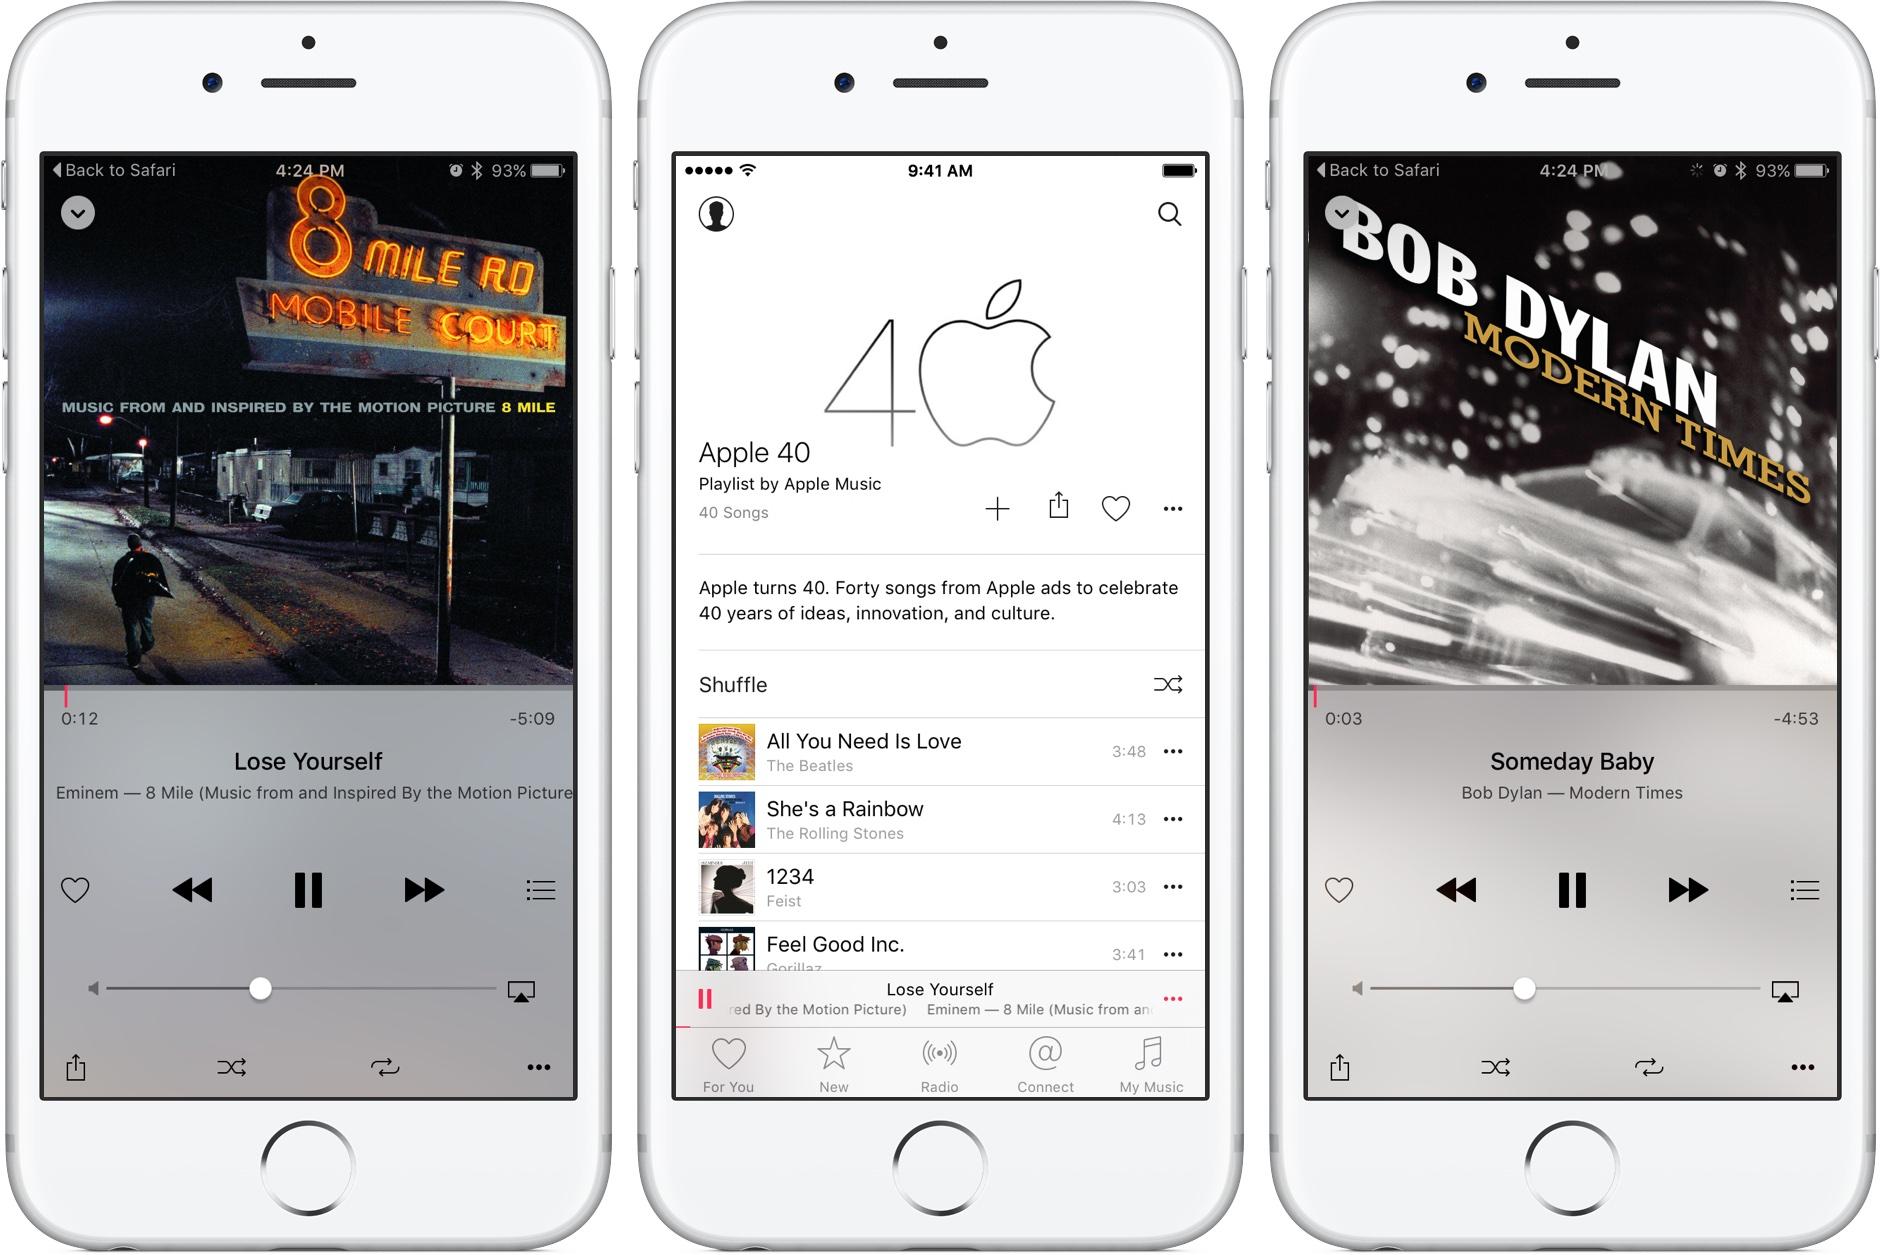 Apple-Music-40-Years-playlist-iPhone-screenshot-002